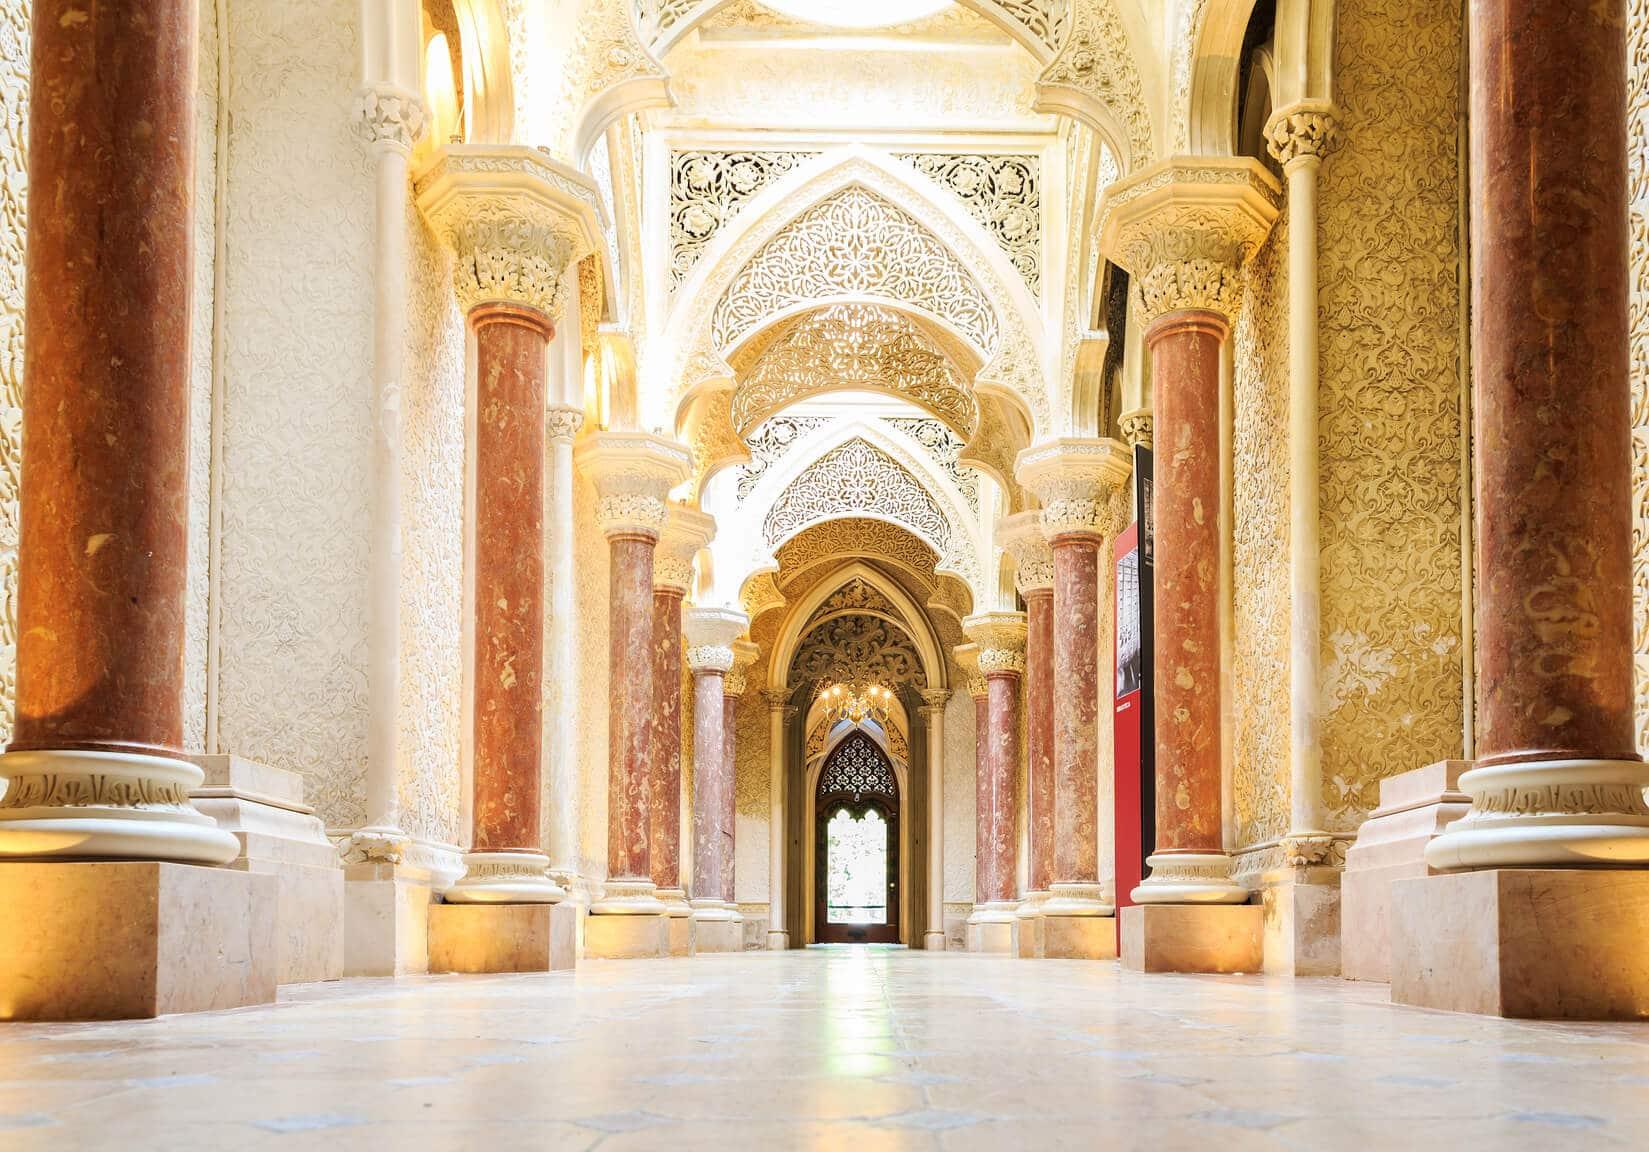 Visita Guiada Sintra: Interior de Palácio em Sintra